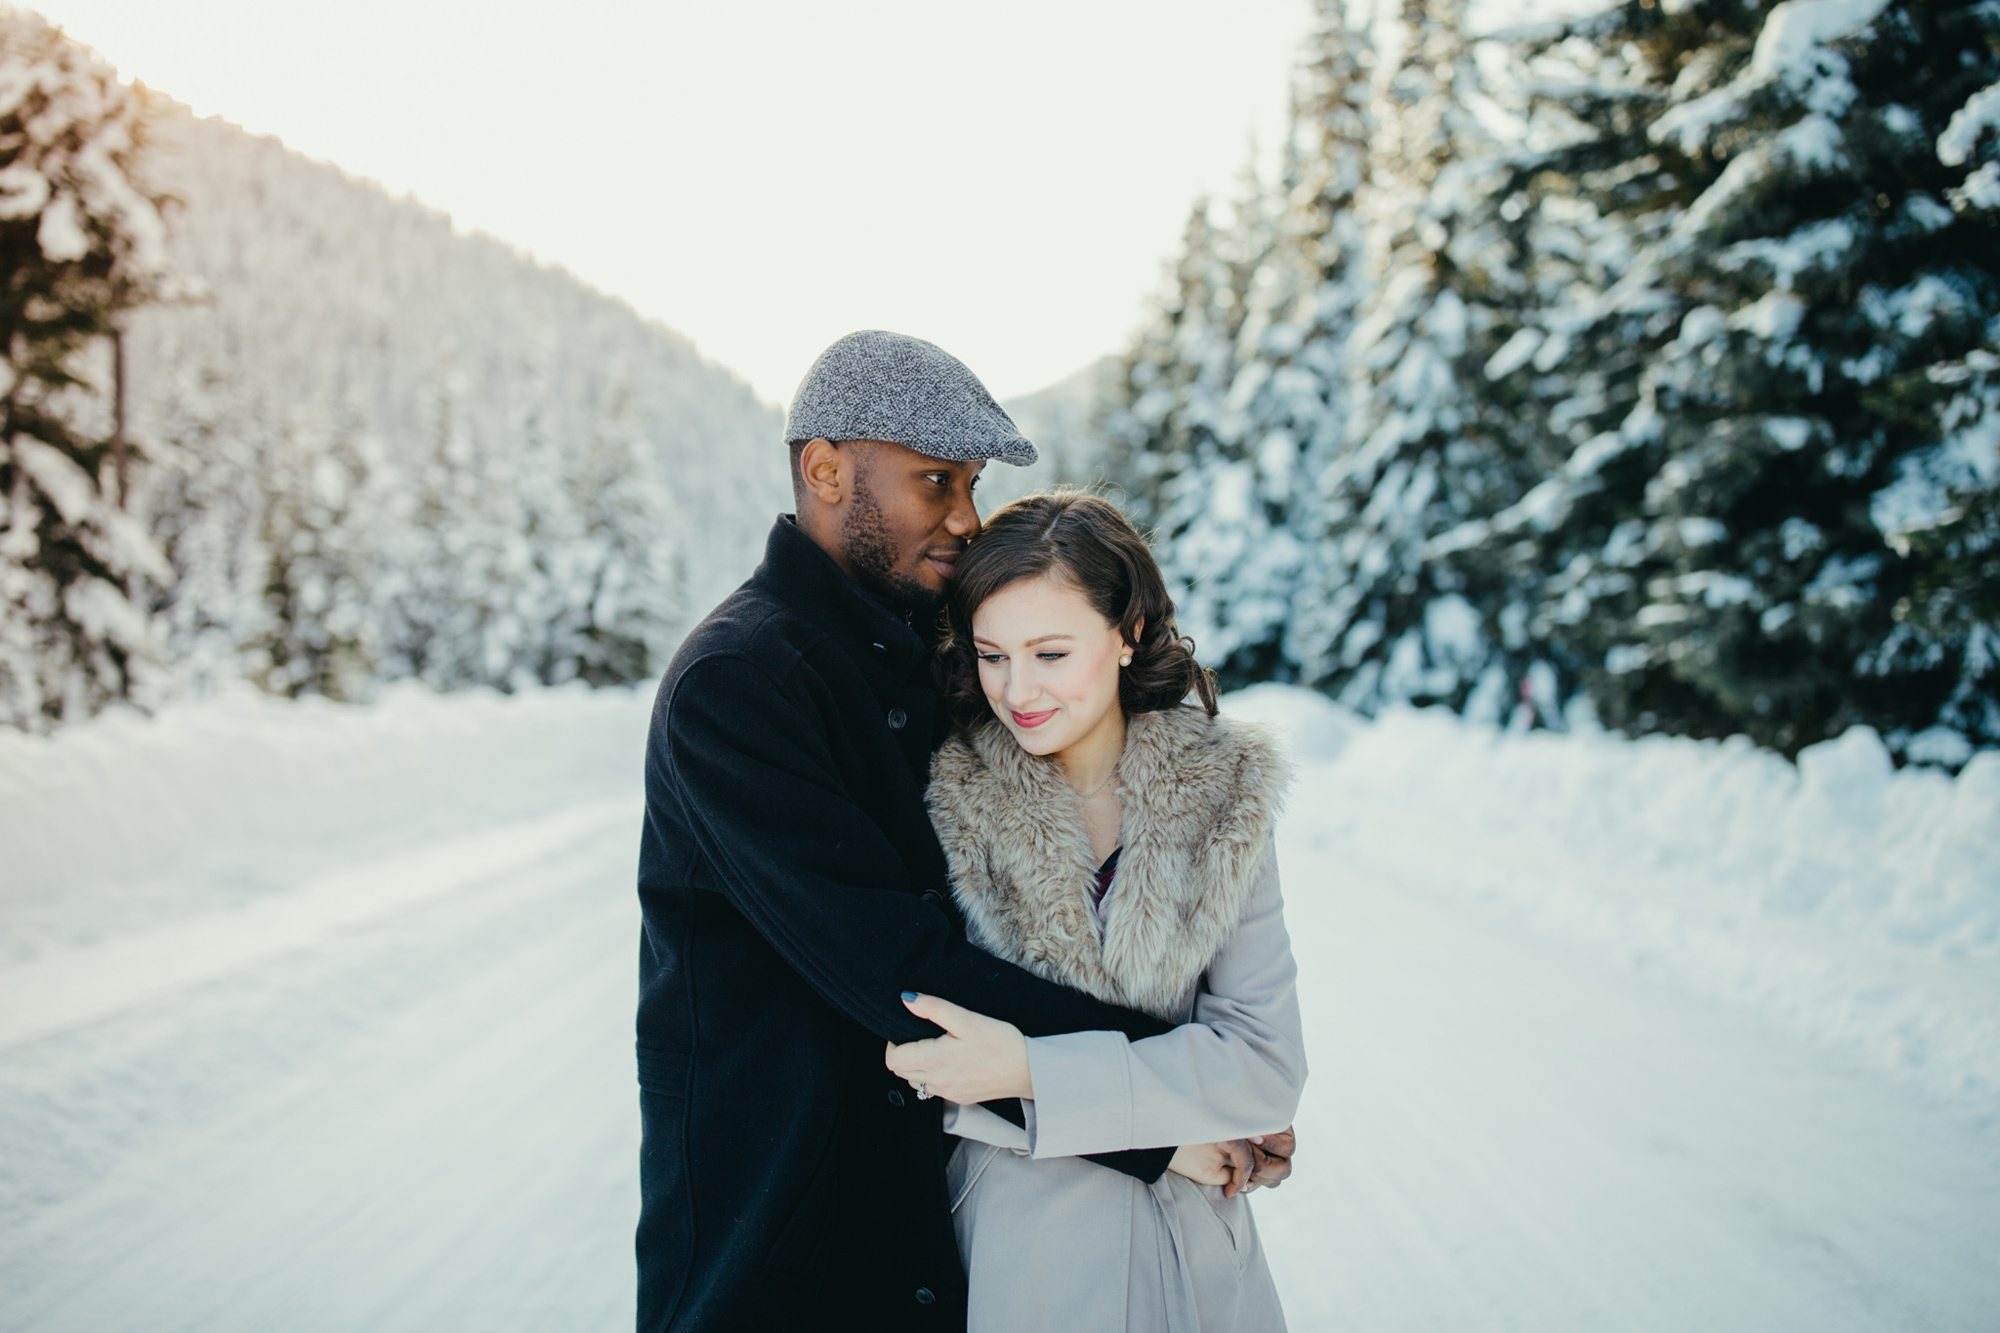 003-adventure-engagement-photographer